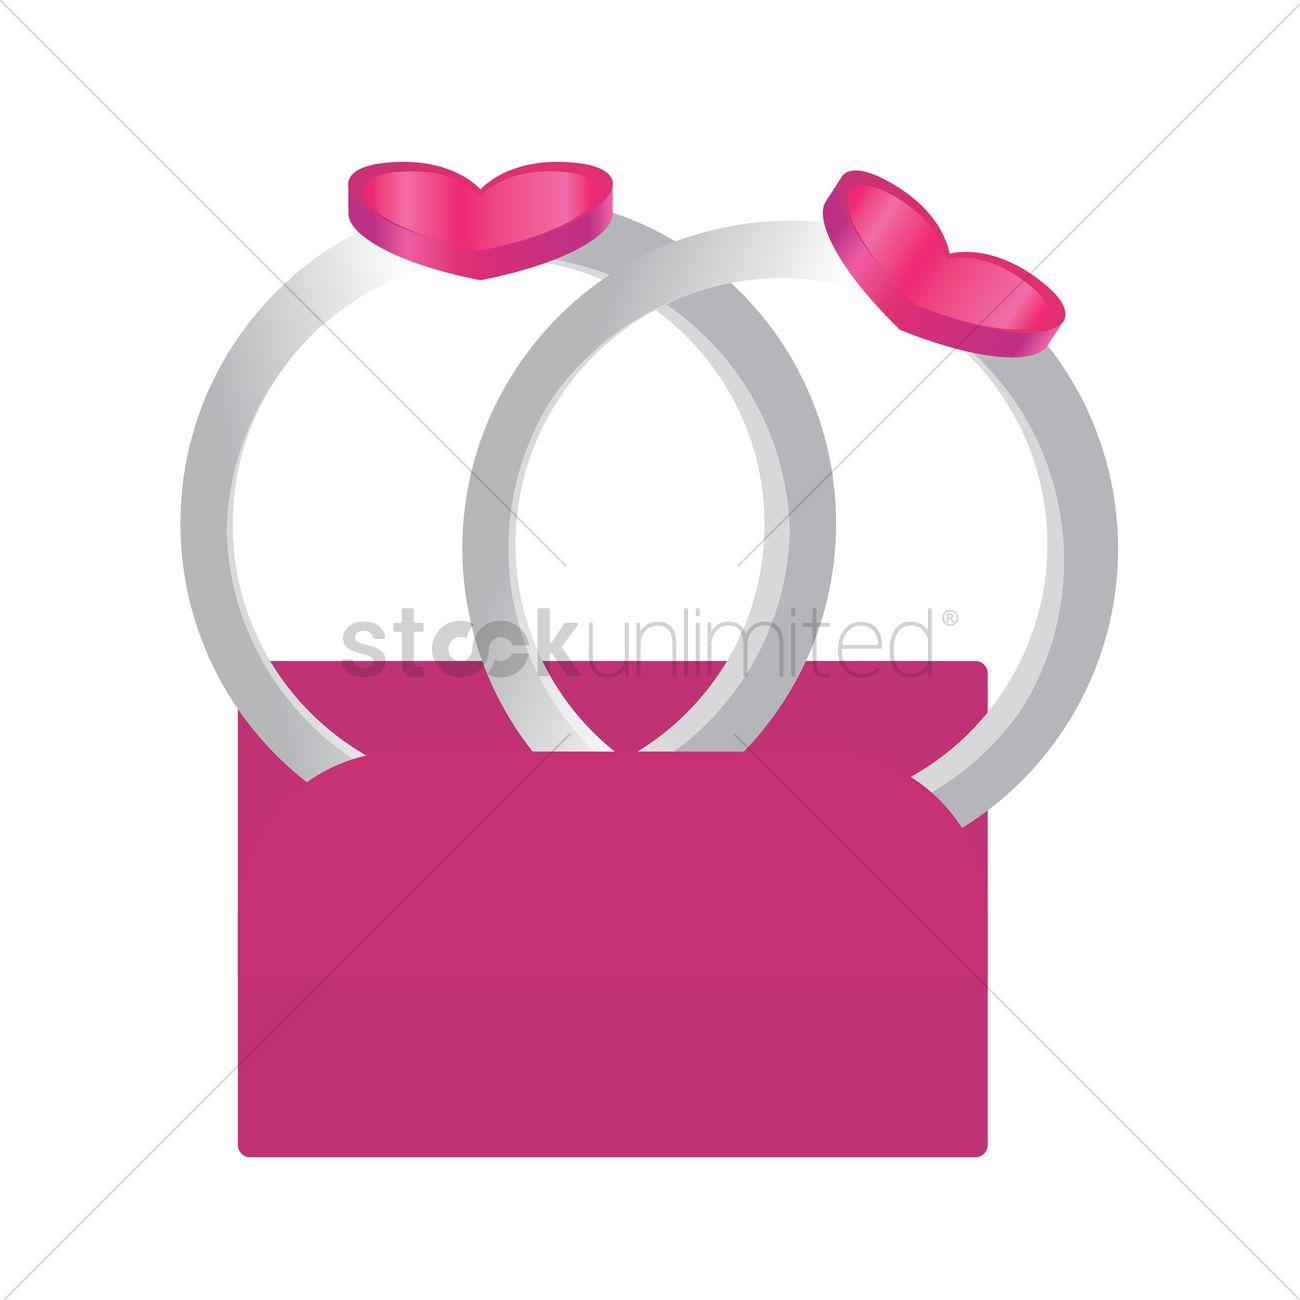 Wedding rings Vector Image - 1332214 | StockUnlimited